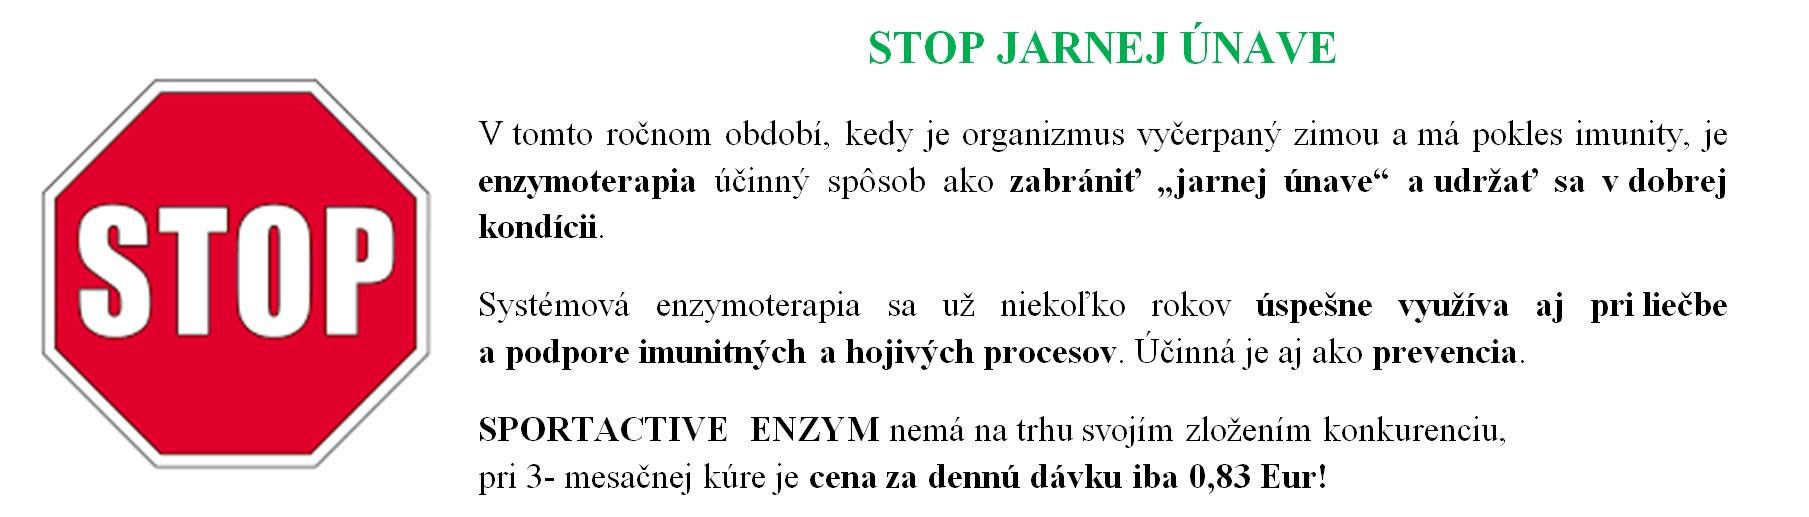 STOP jarnej únave!